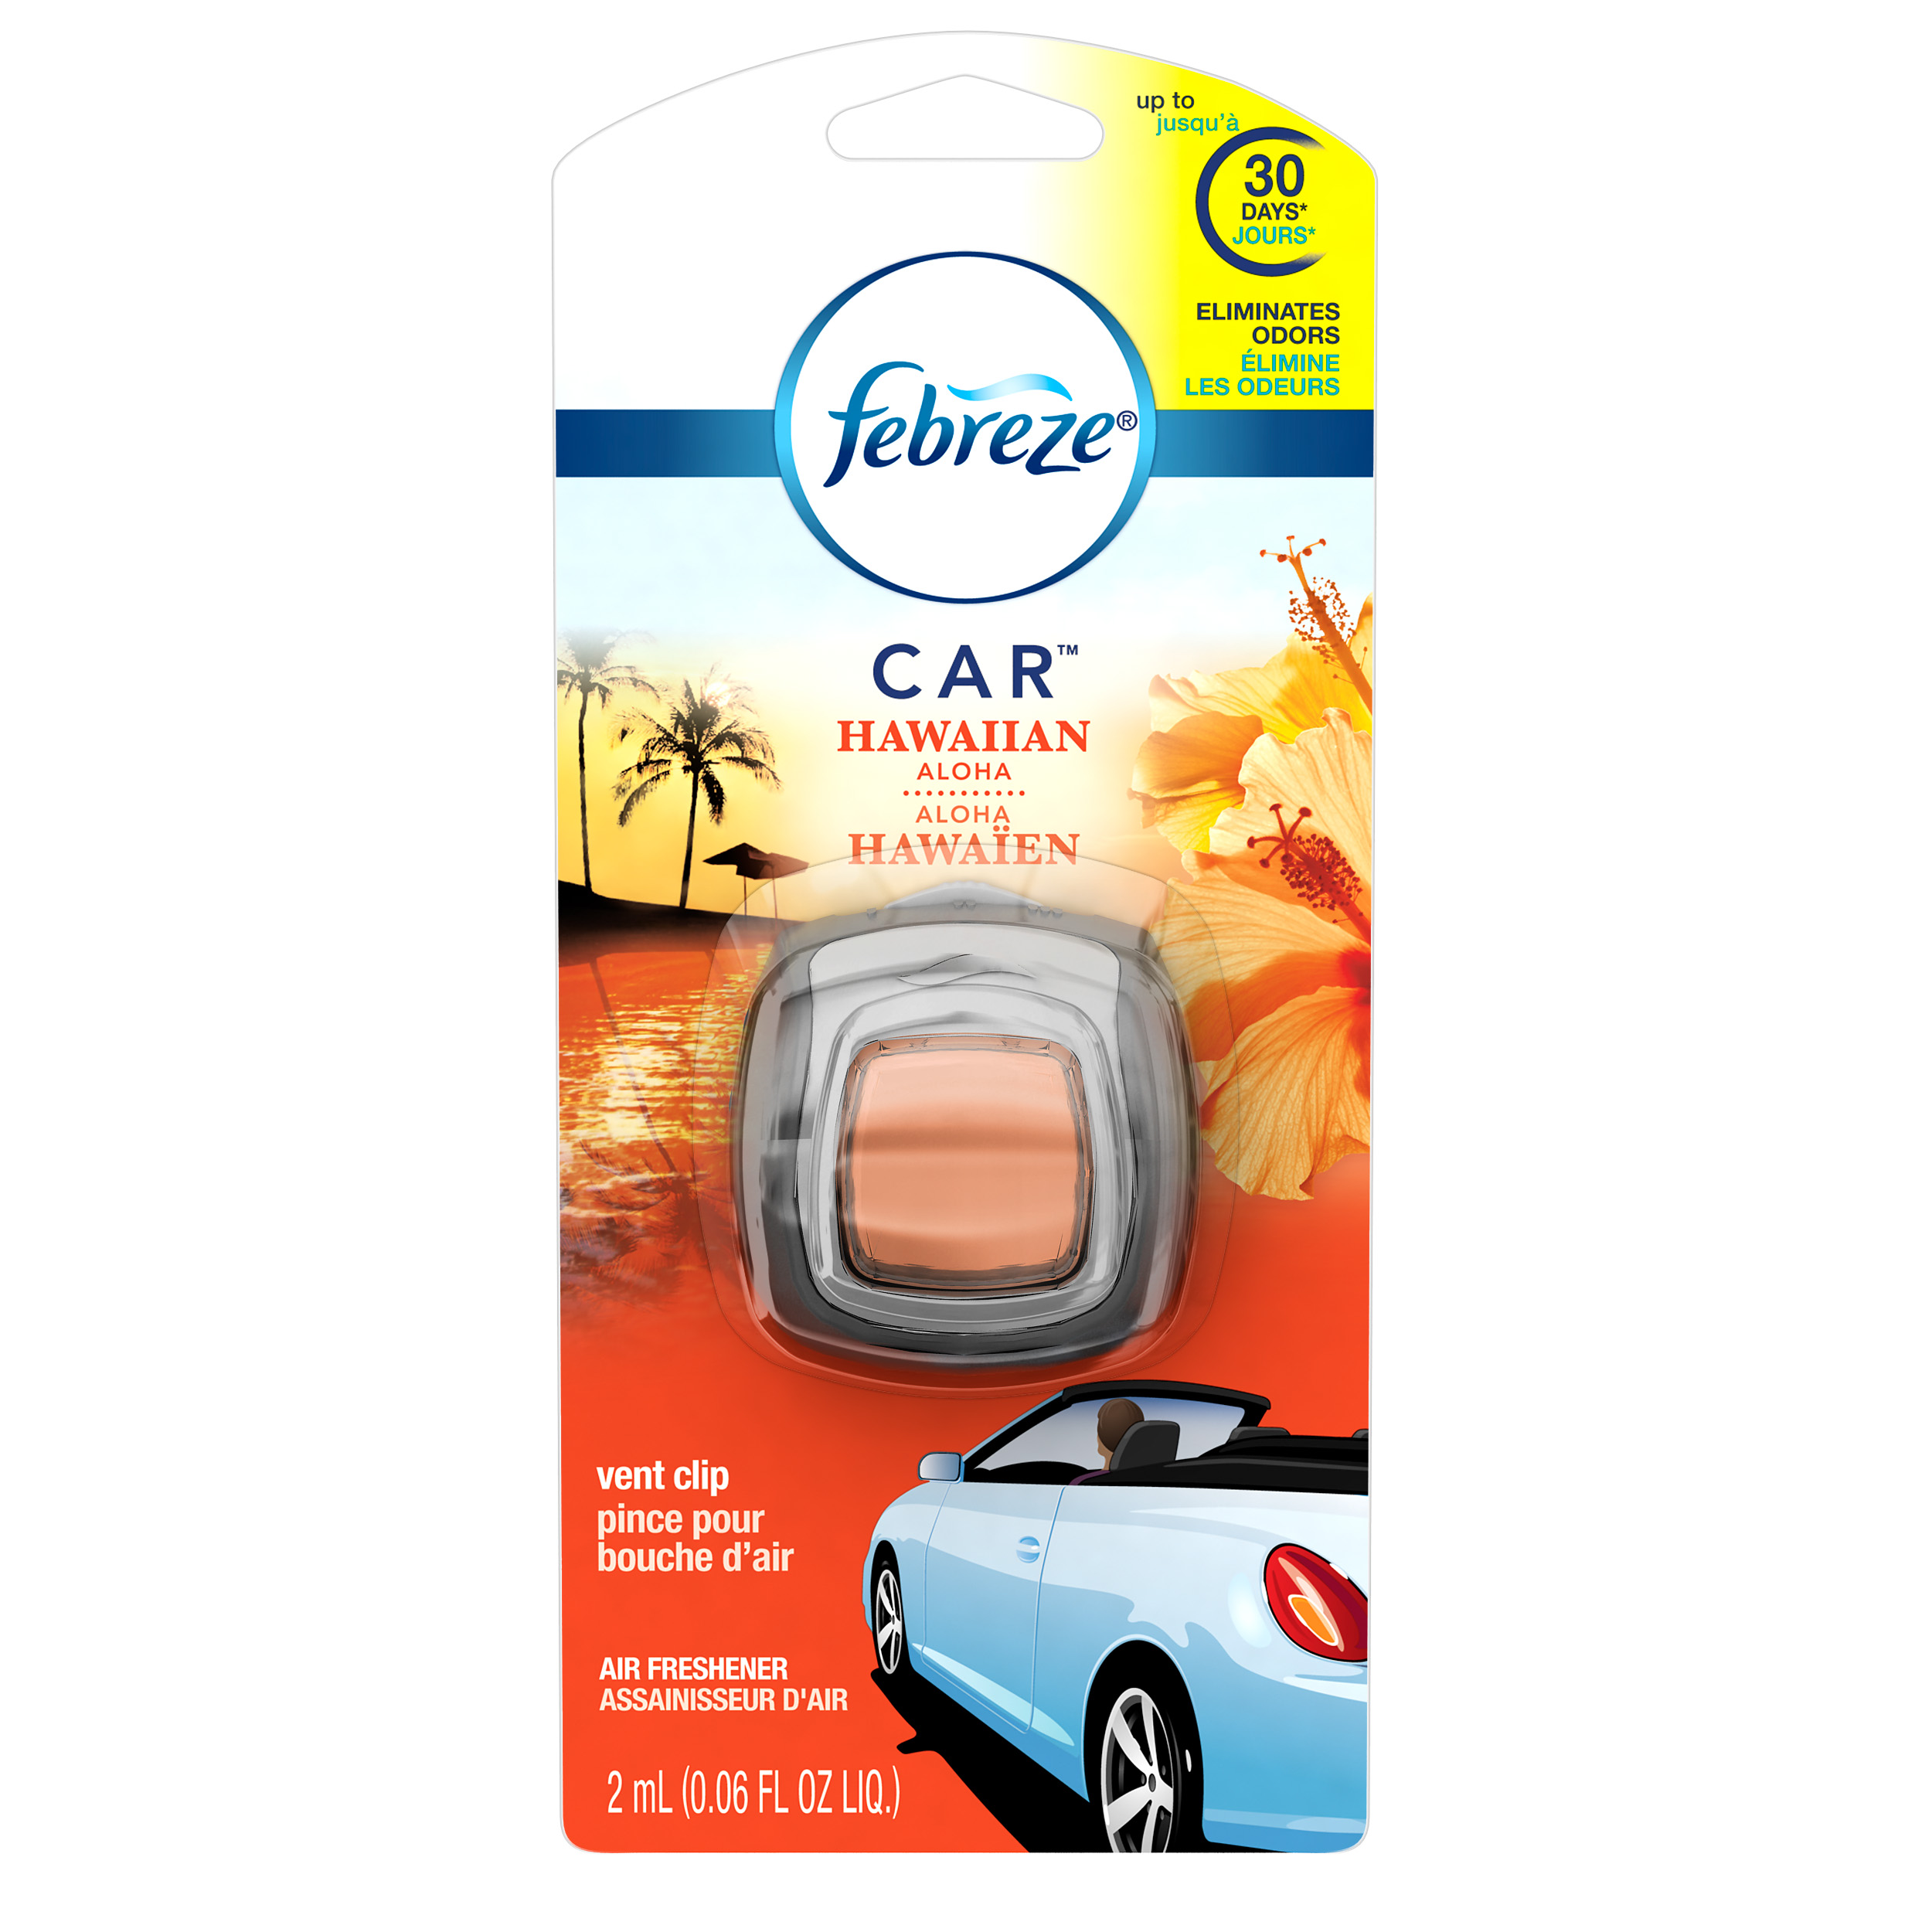 Febreze CAR Air Freshener Hawaiian Aloha (1 Count, 0.06 oz)